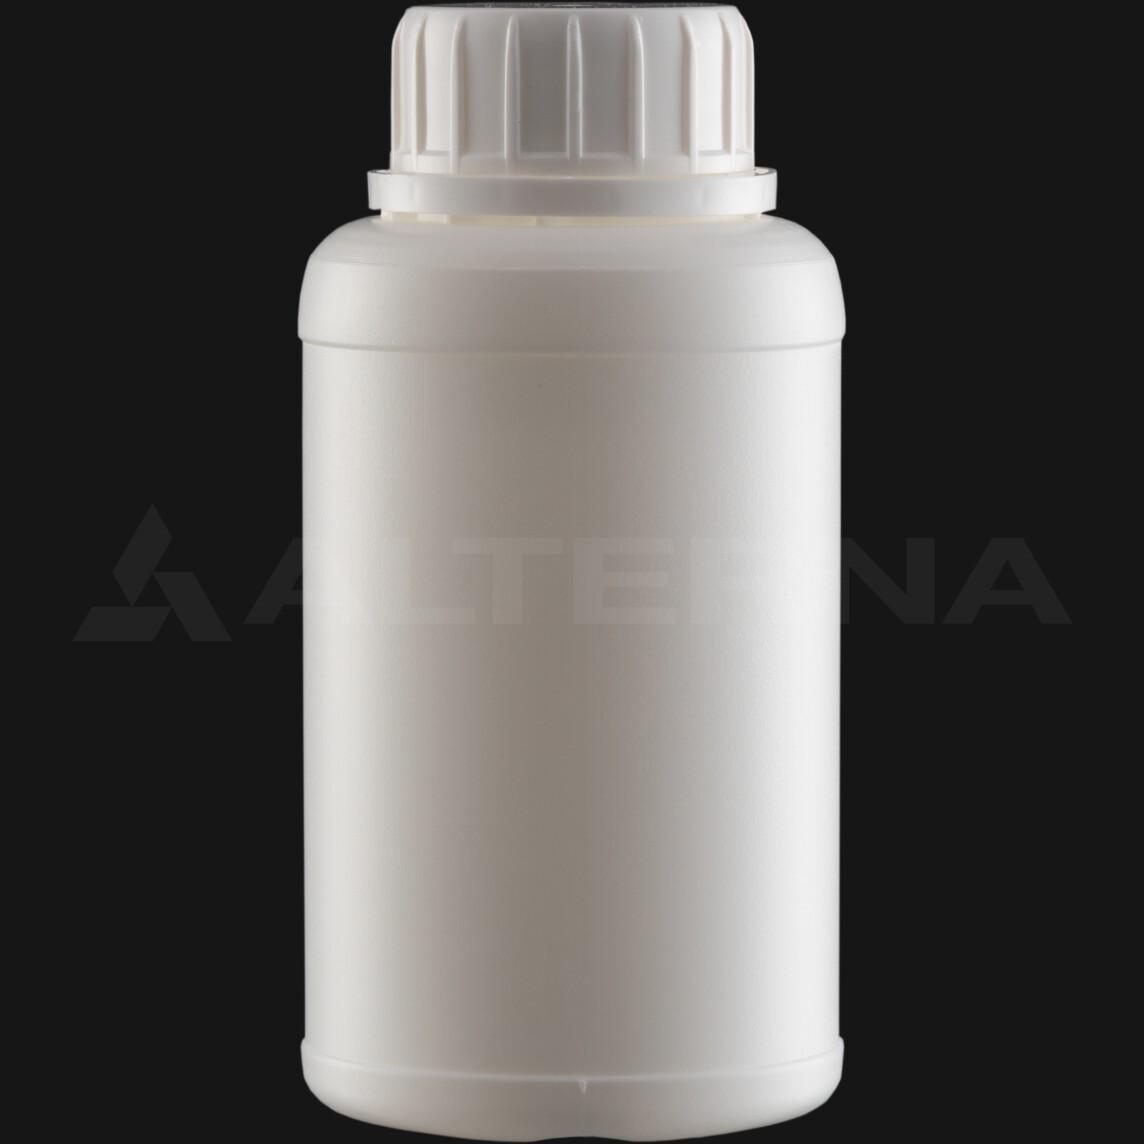 250 ml HDPE Bottle with 38 mm Foam Seal Secure Cap